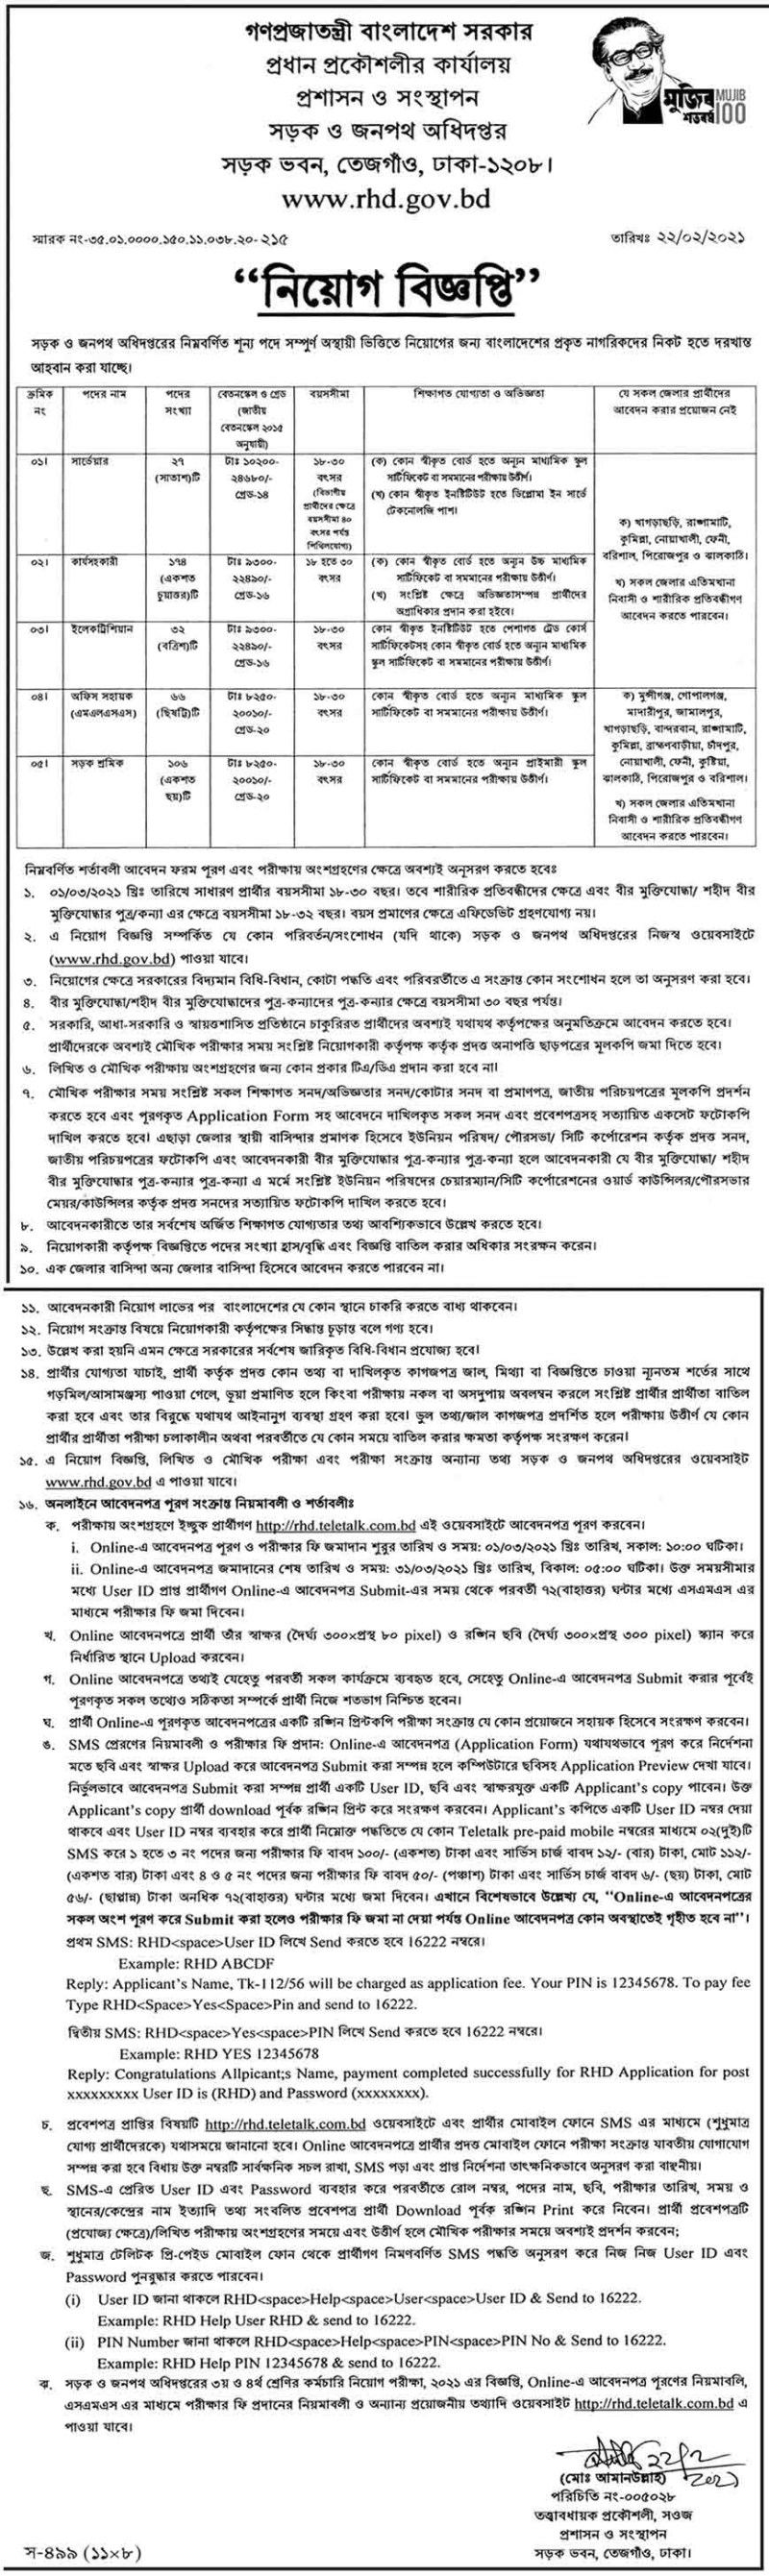 Department of Roads and Highways Job Circular 2021 (Image)